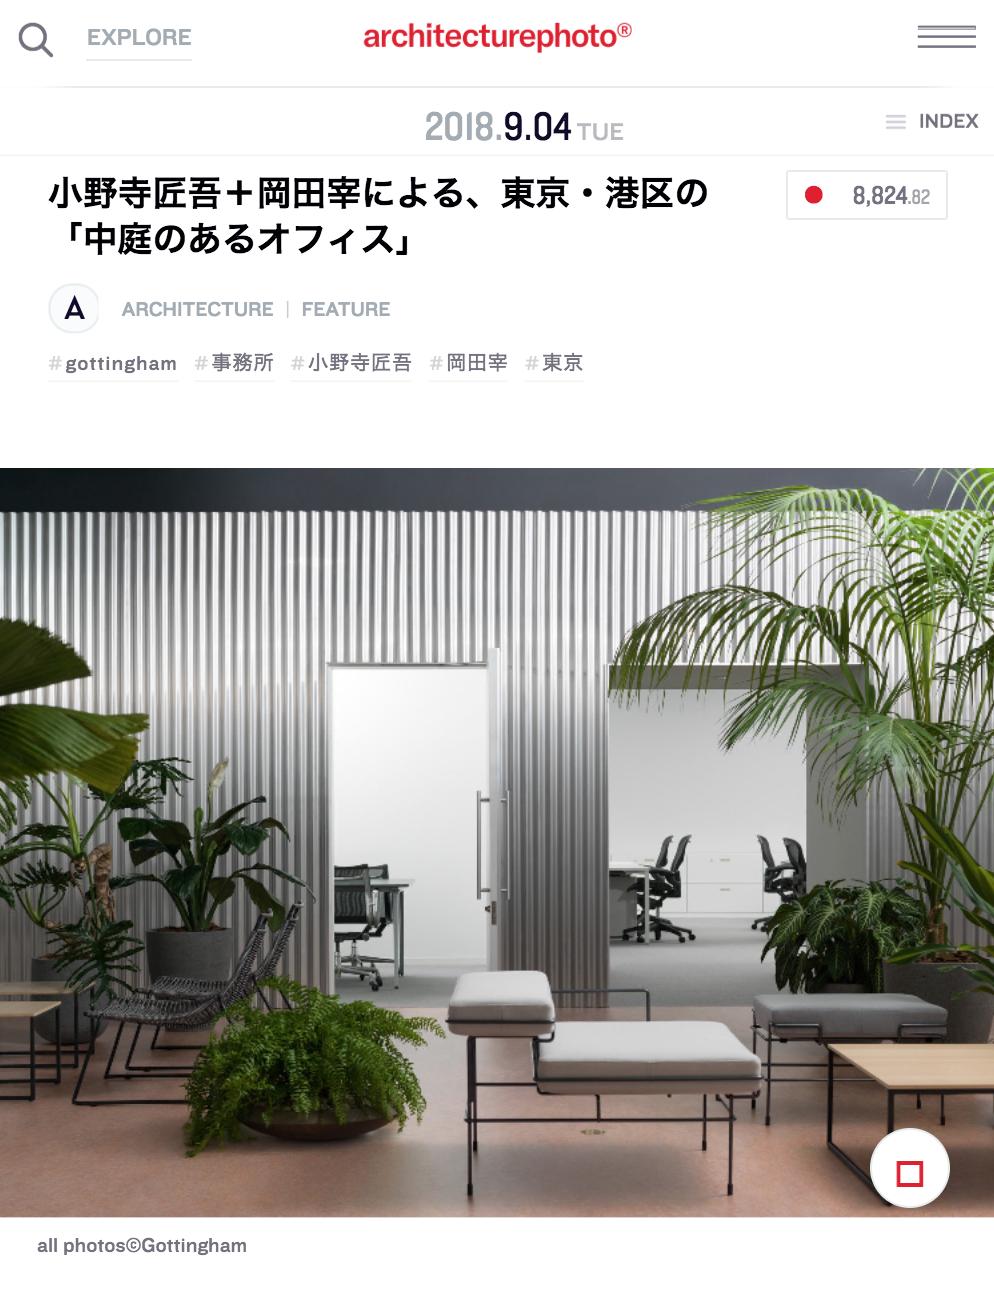 architecturephoto.net 2018年9月 中庭のあるオフィス | Office with a Patio